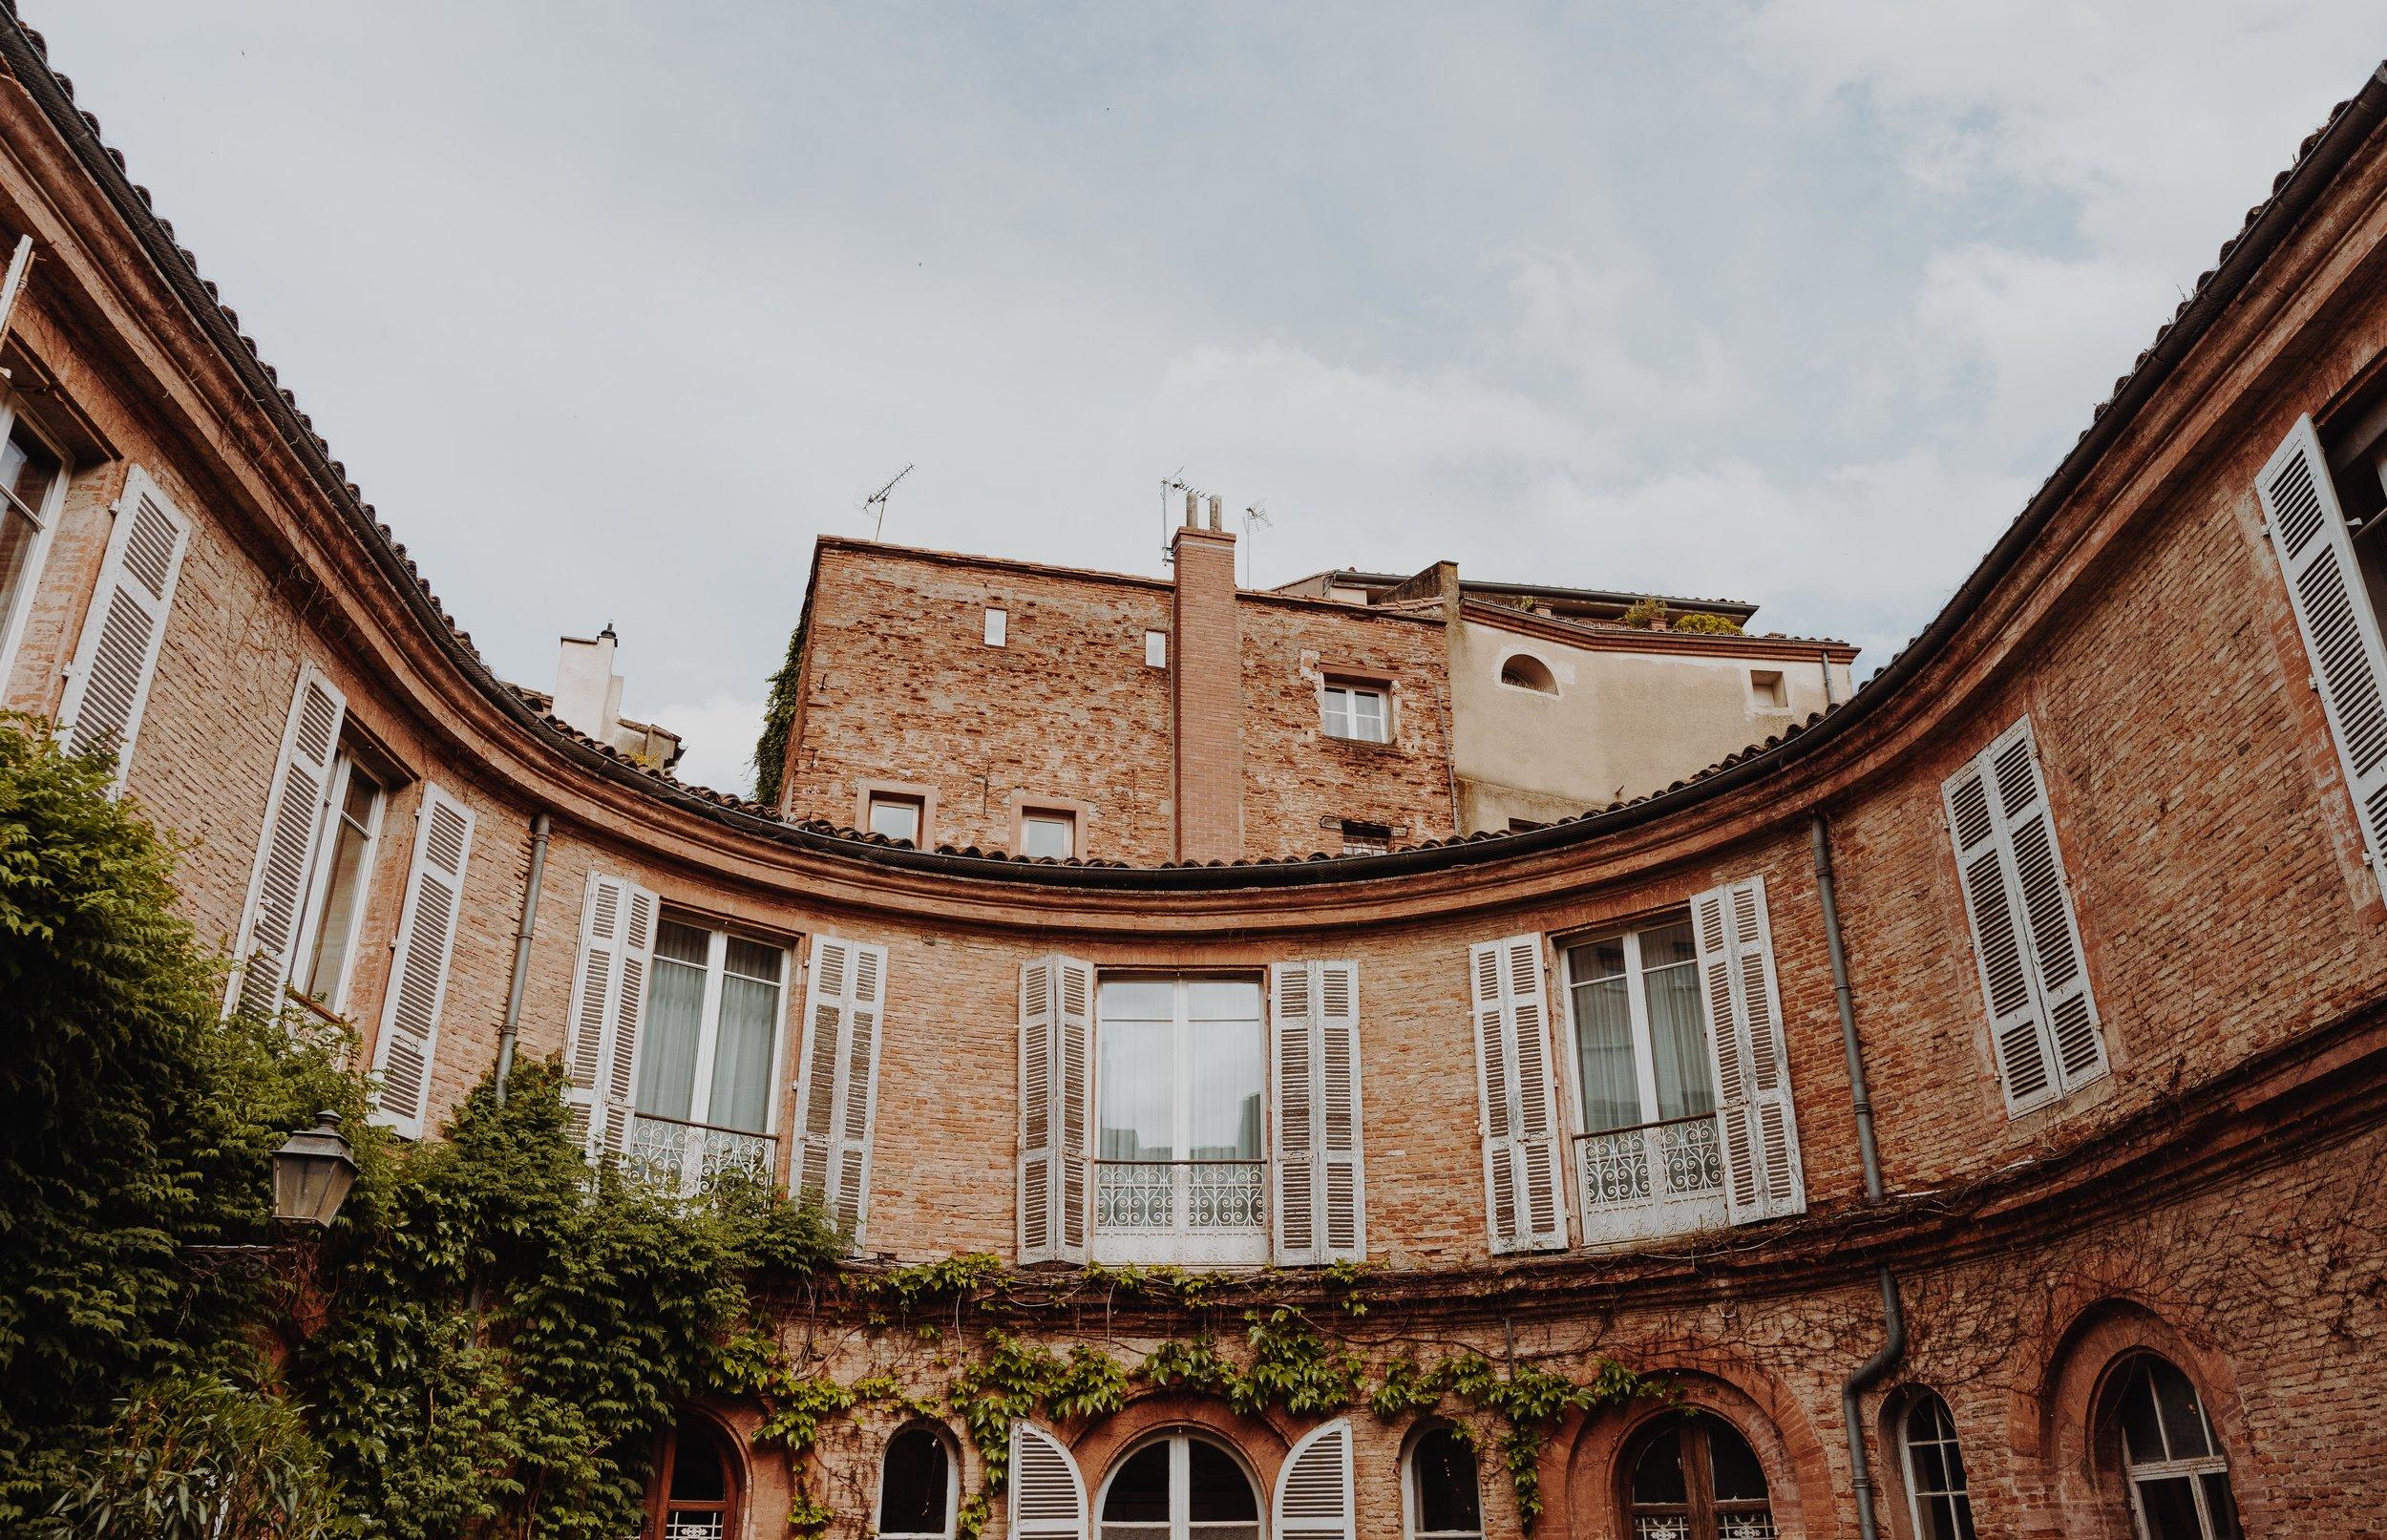 ASROSENVINGE_AtoutFrance_Toulouse_Courtyard_LowRes-04791.jpg